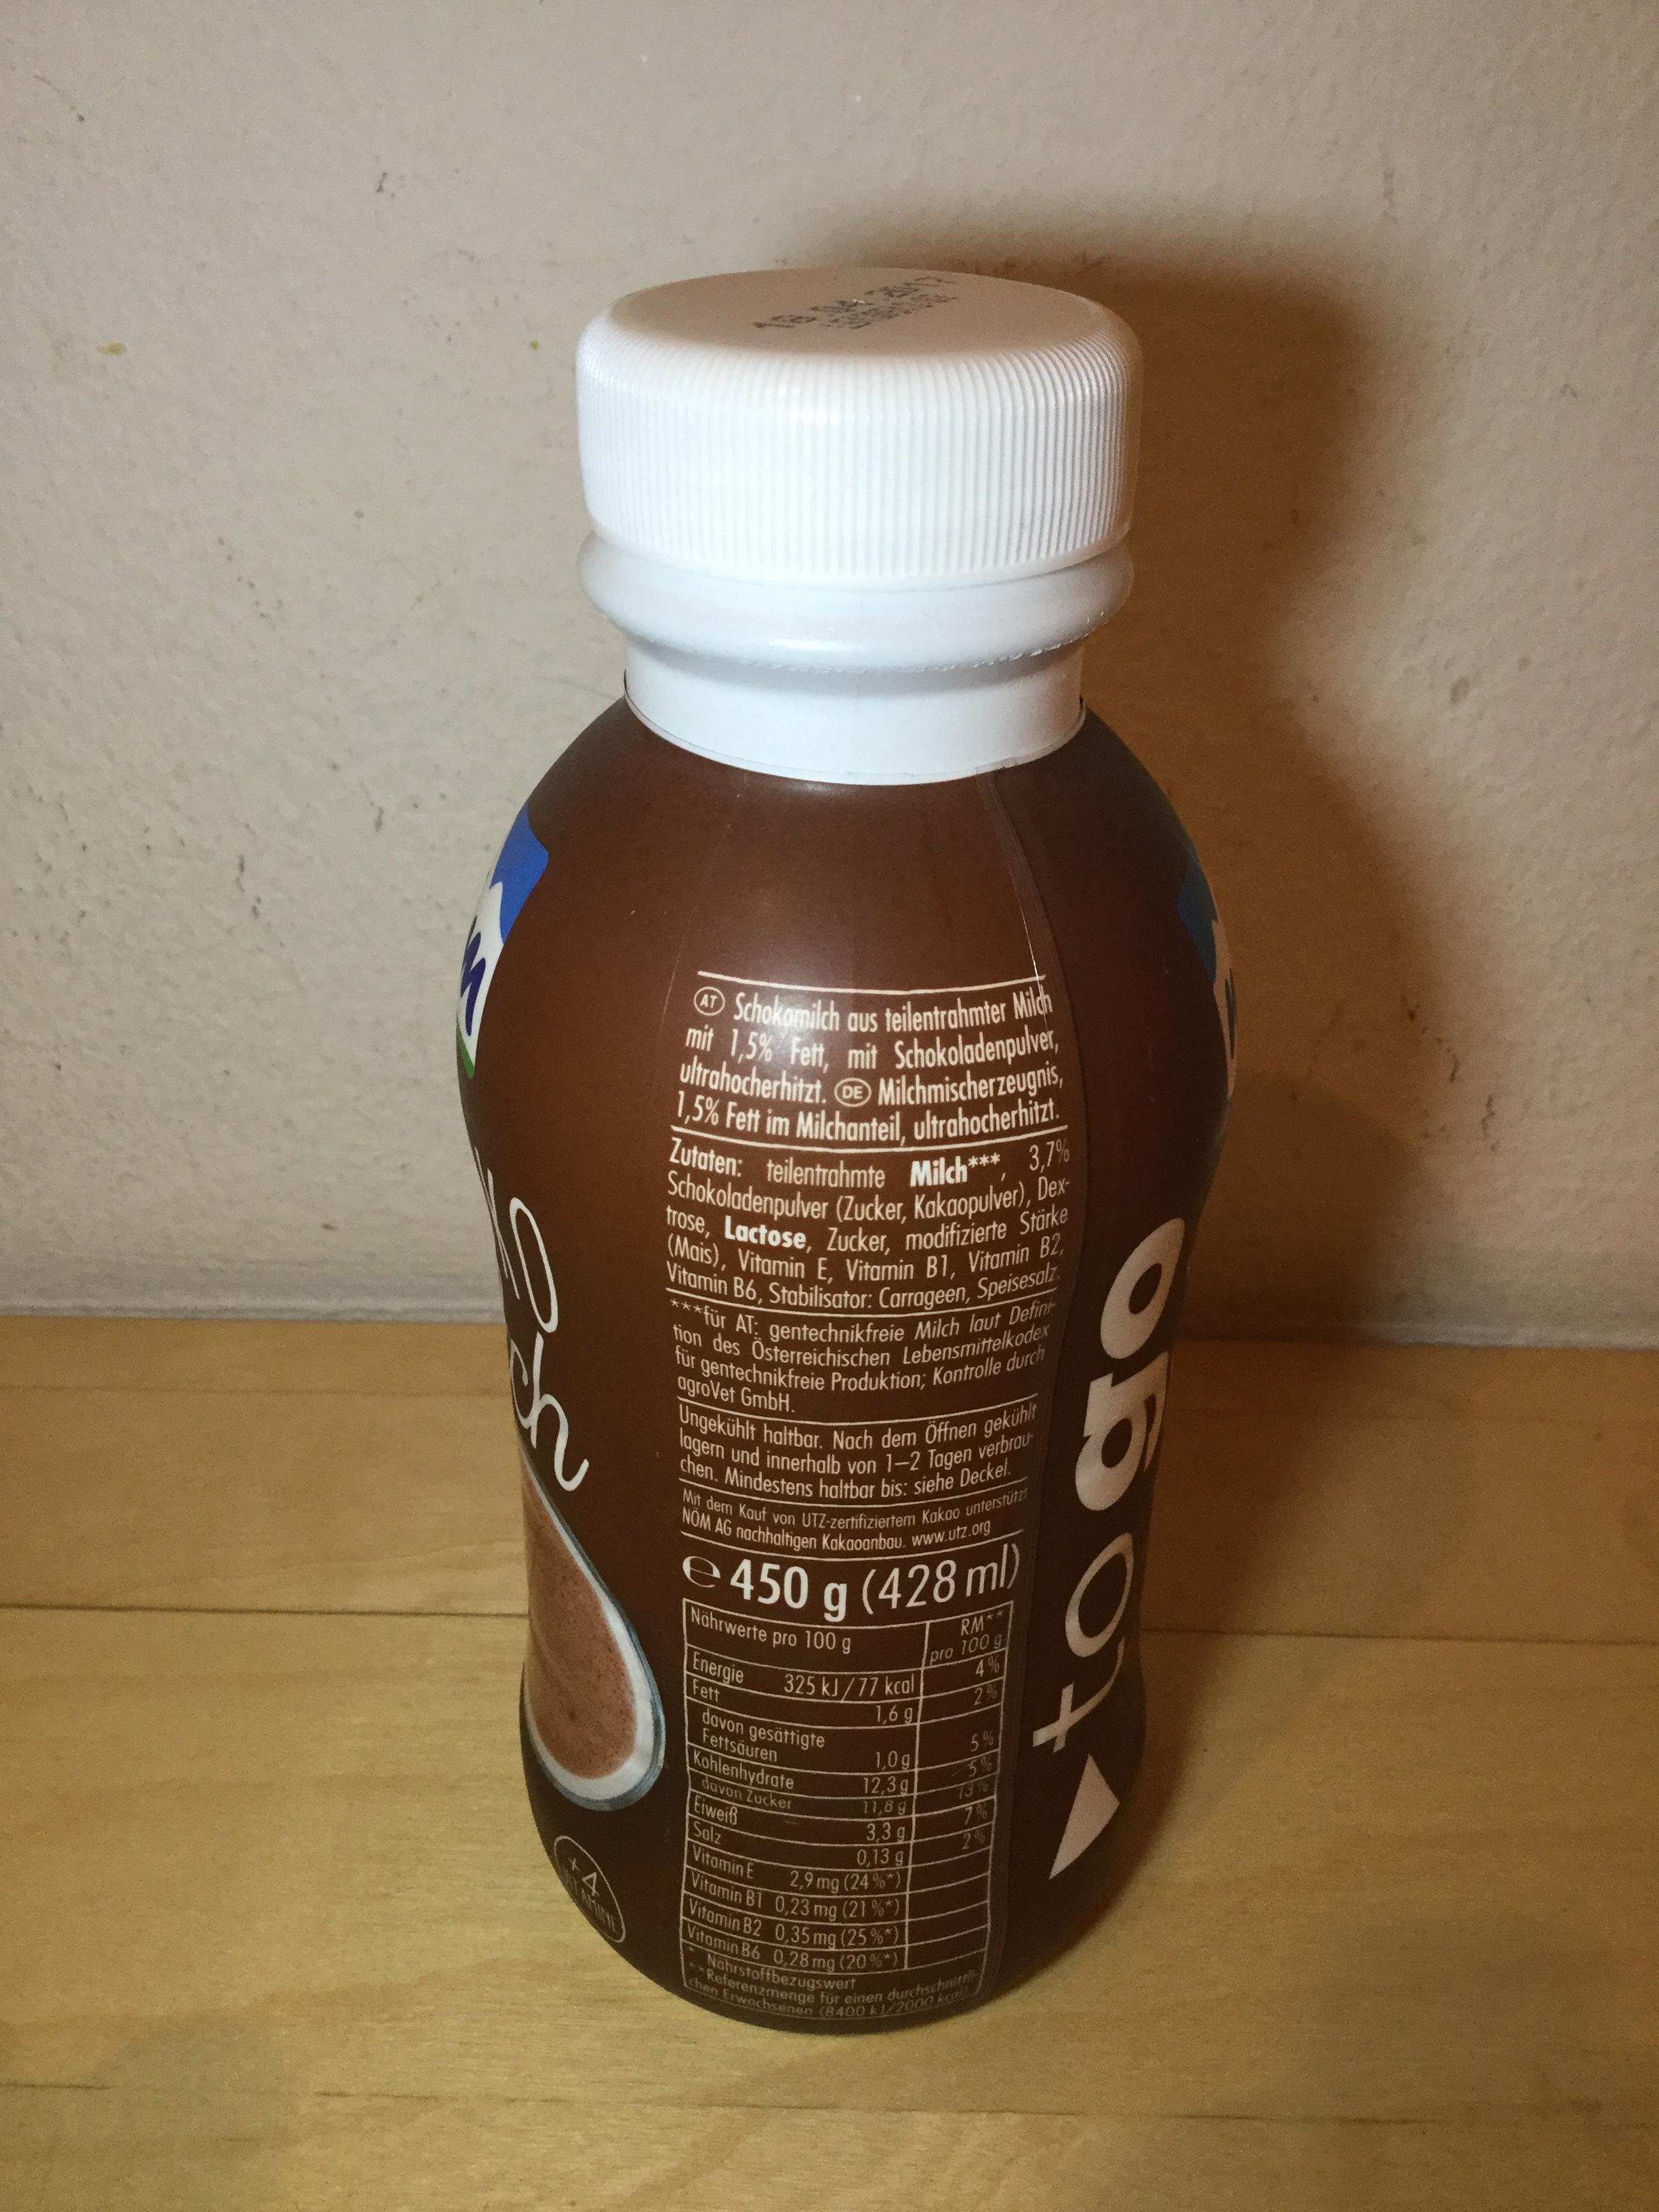 Nom To Go Schoko Milch Side 1